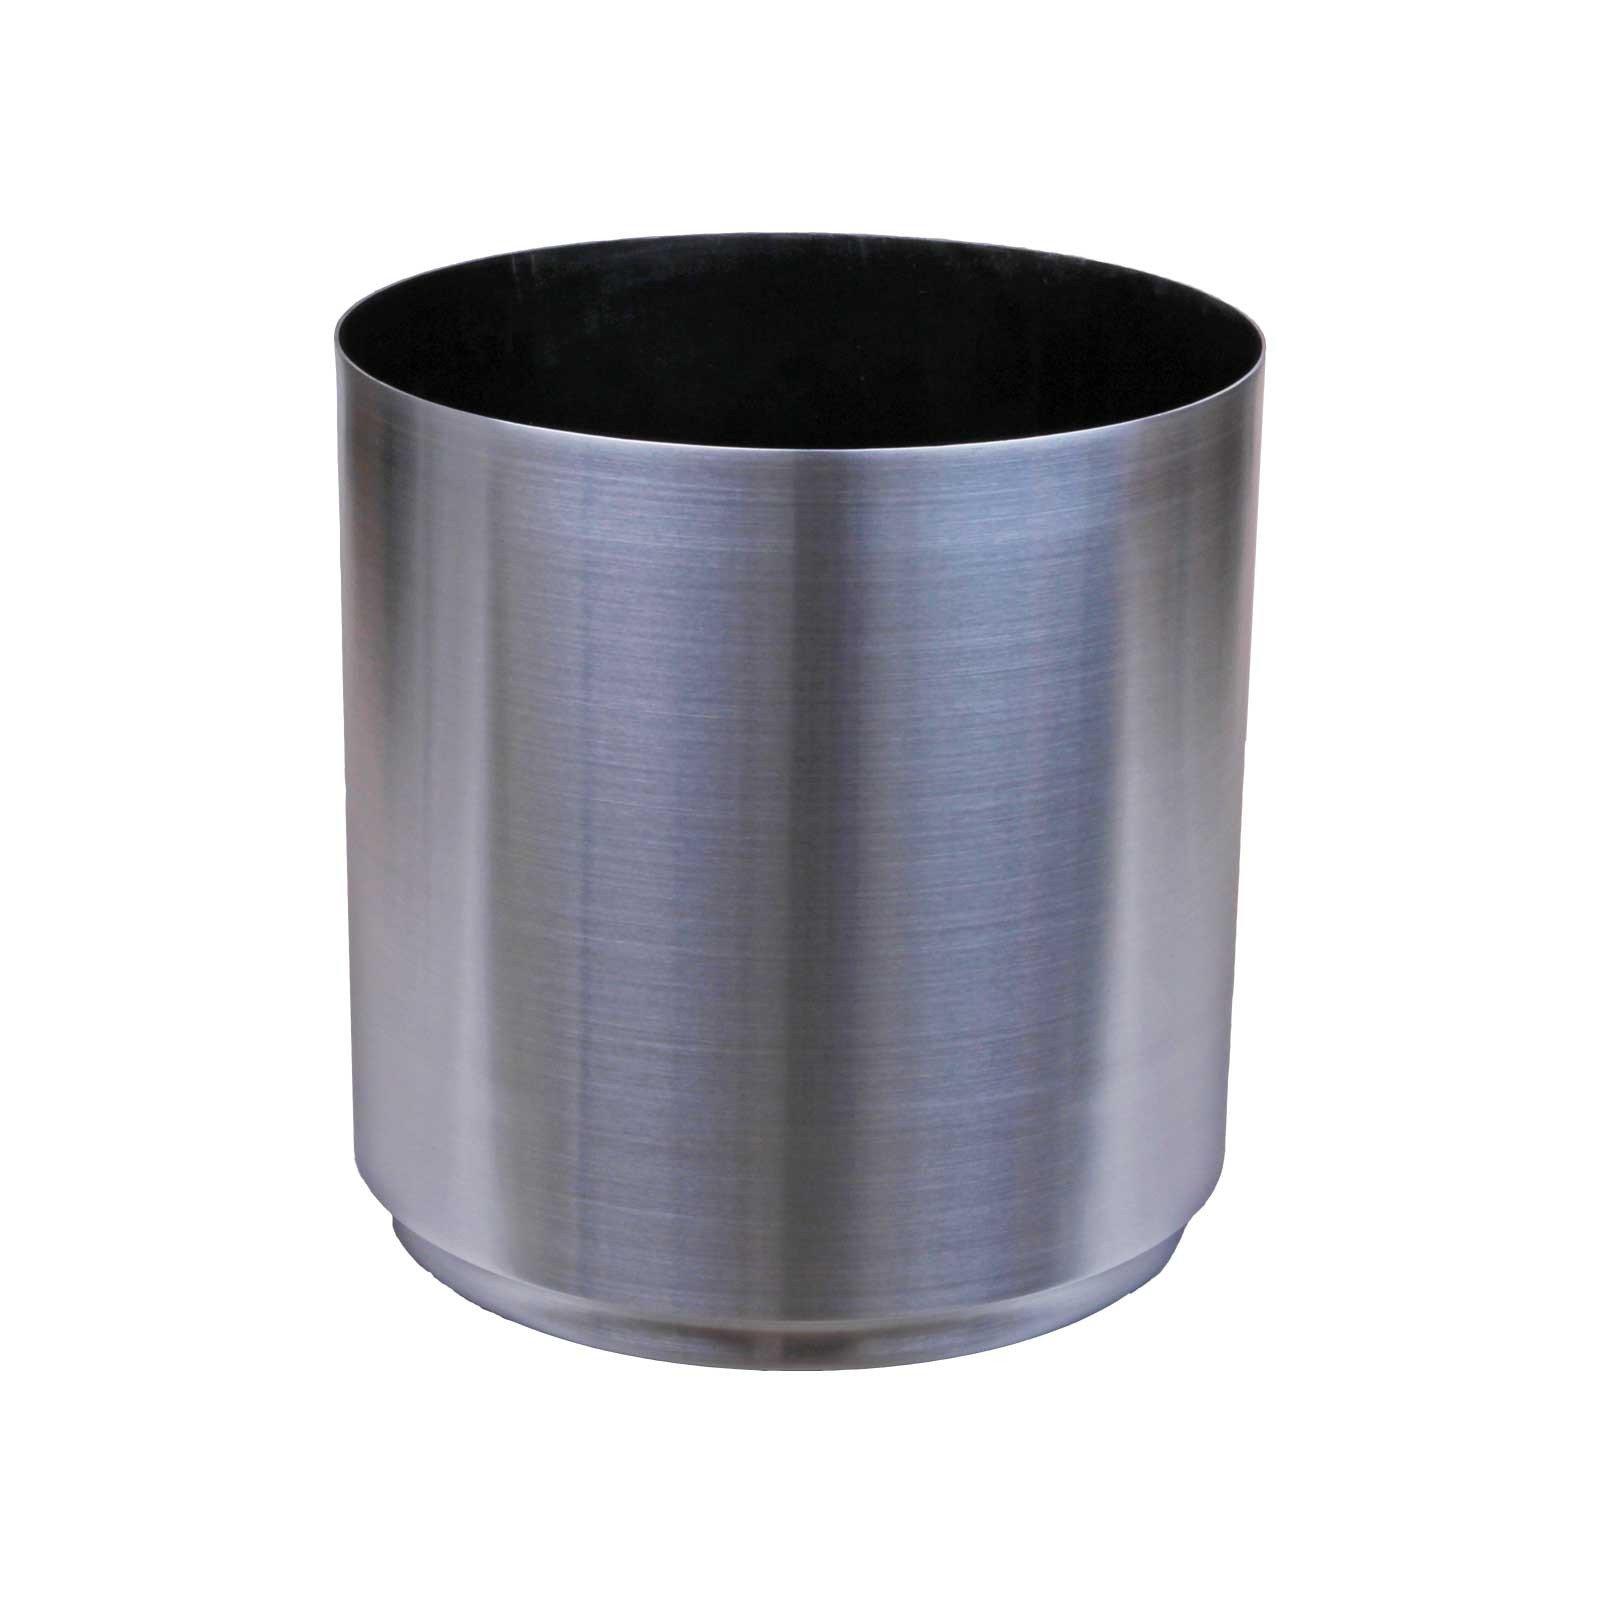 Oso Polar Small Aluminum